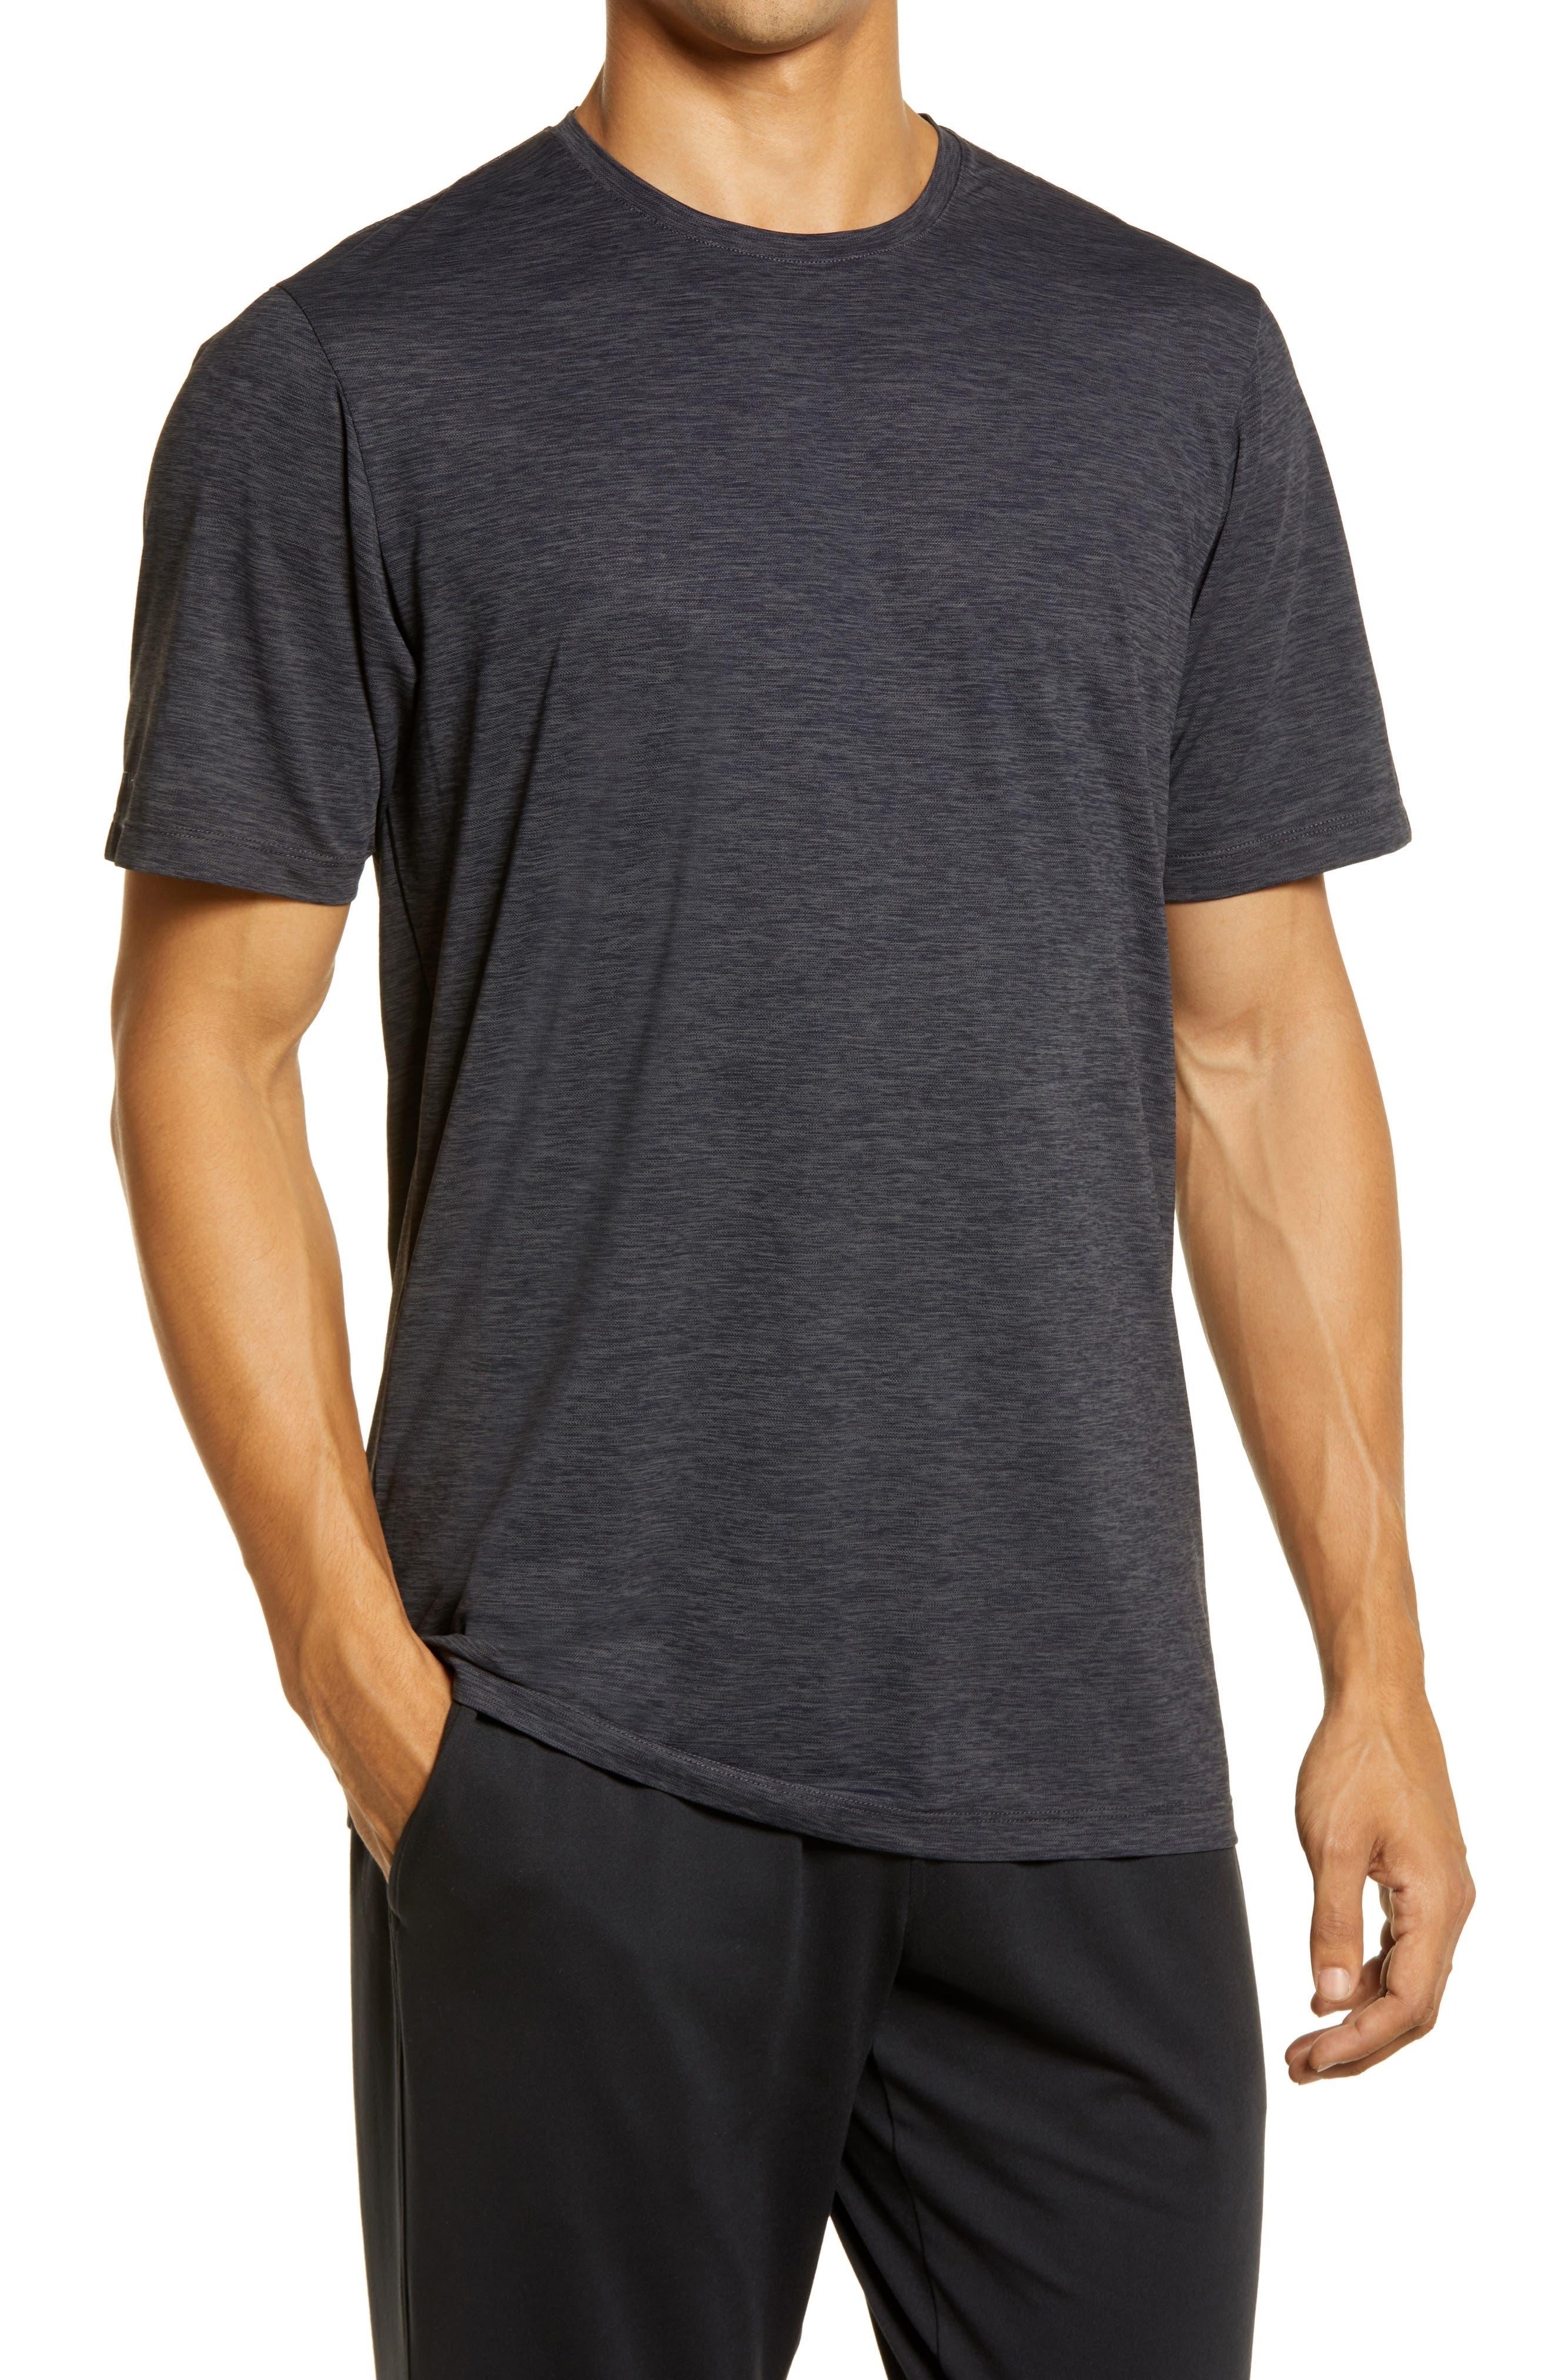 Low Pro Tech Short Sleeve T-Shirt